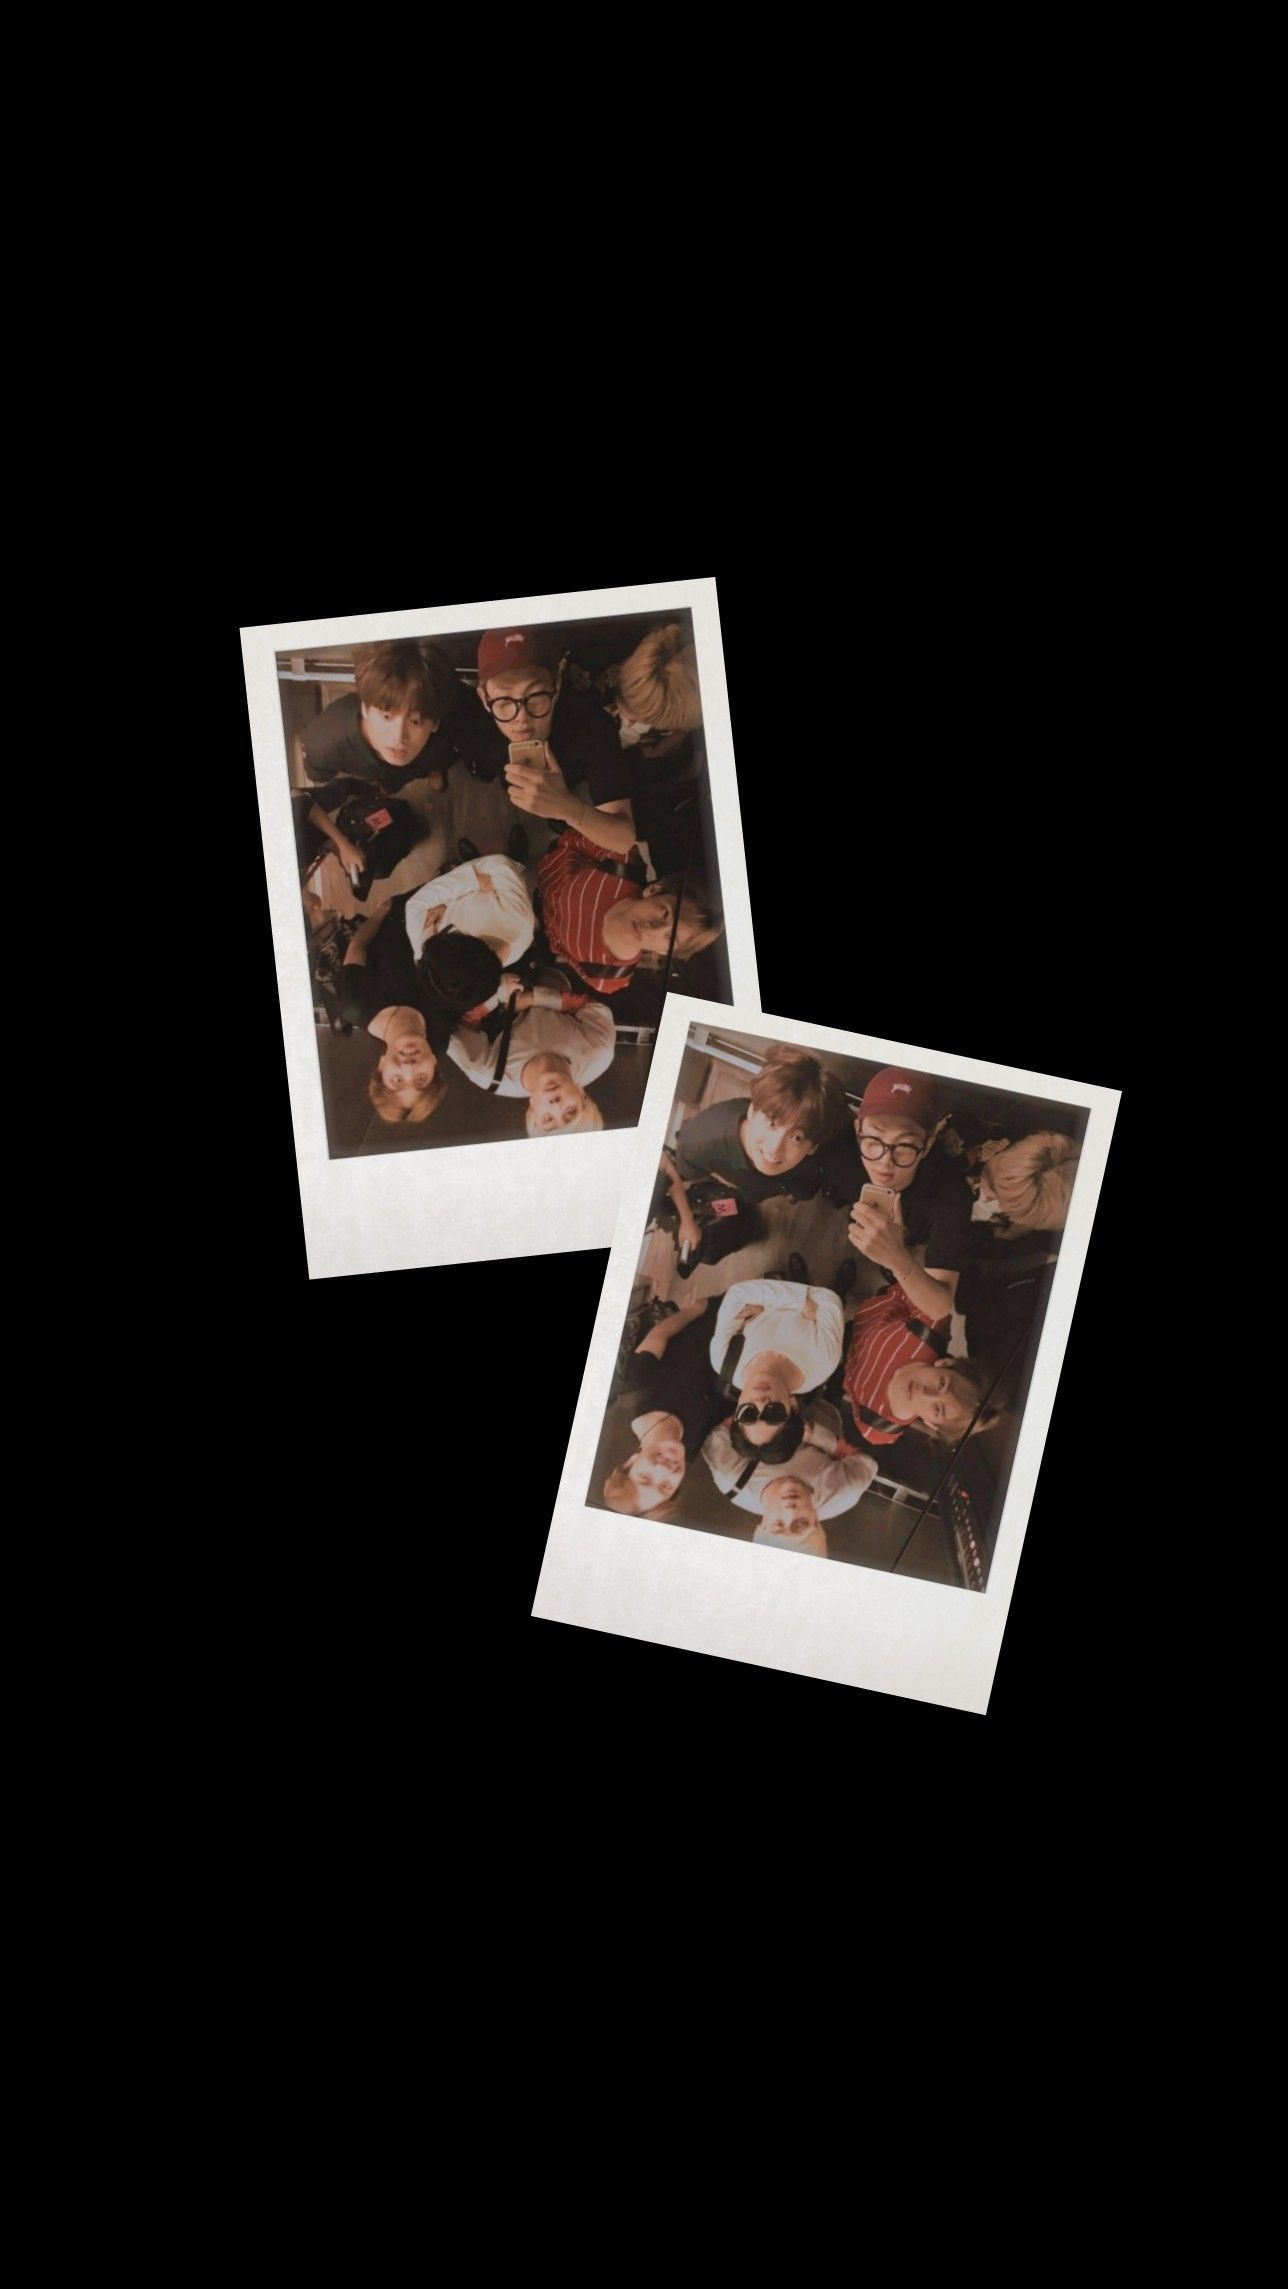 Bts Lockscreen Black Polaroid Bts Aesthetic Black Polaroid Rm Jin Suga J Hope Jimin Taehyung Jungkook Lockscreen Gambar Mata Gambar Bts Wallpaper bts estetik black